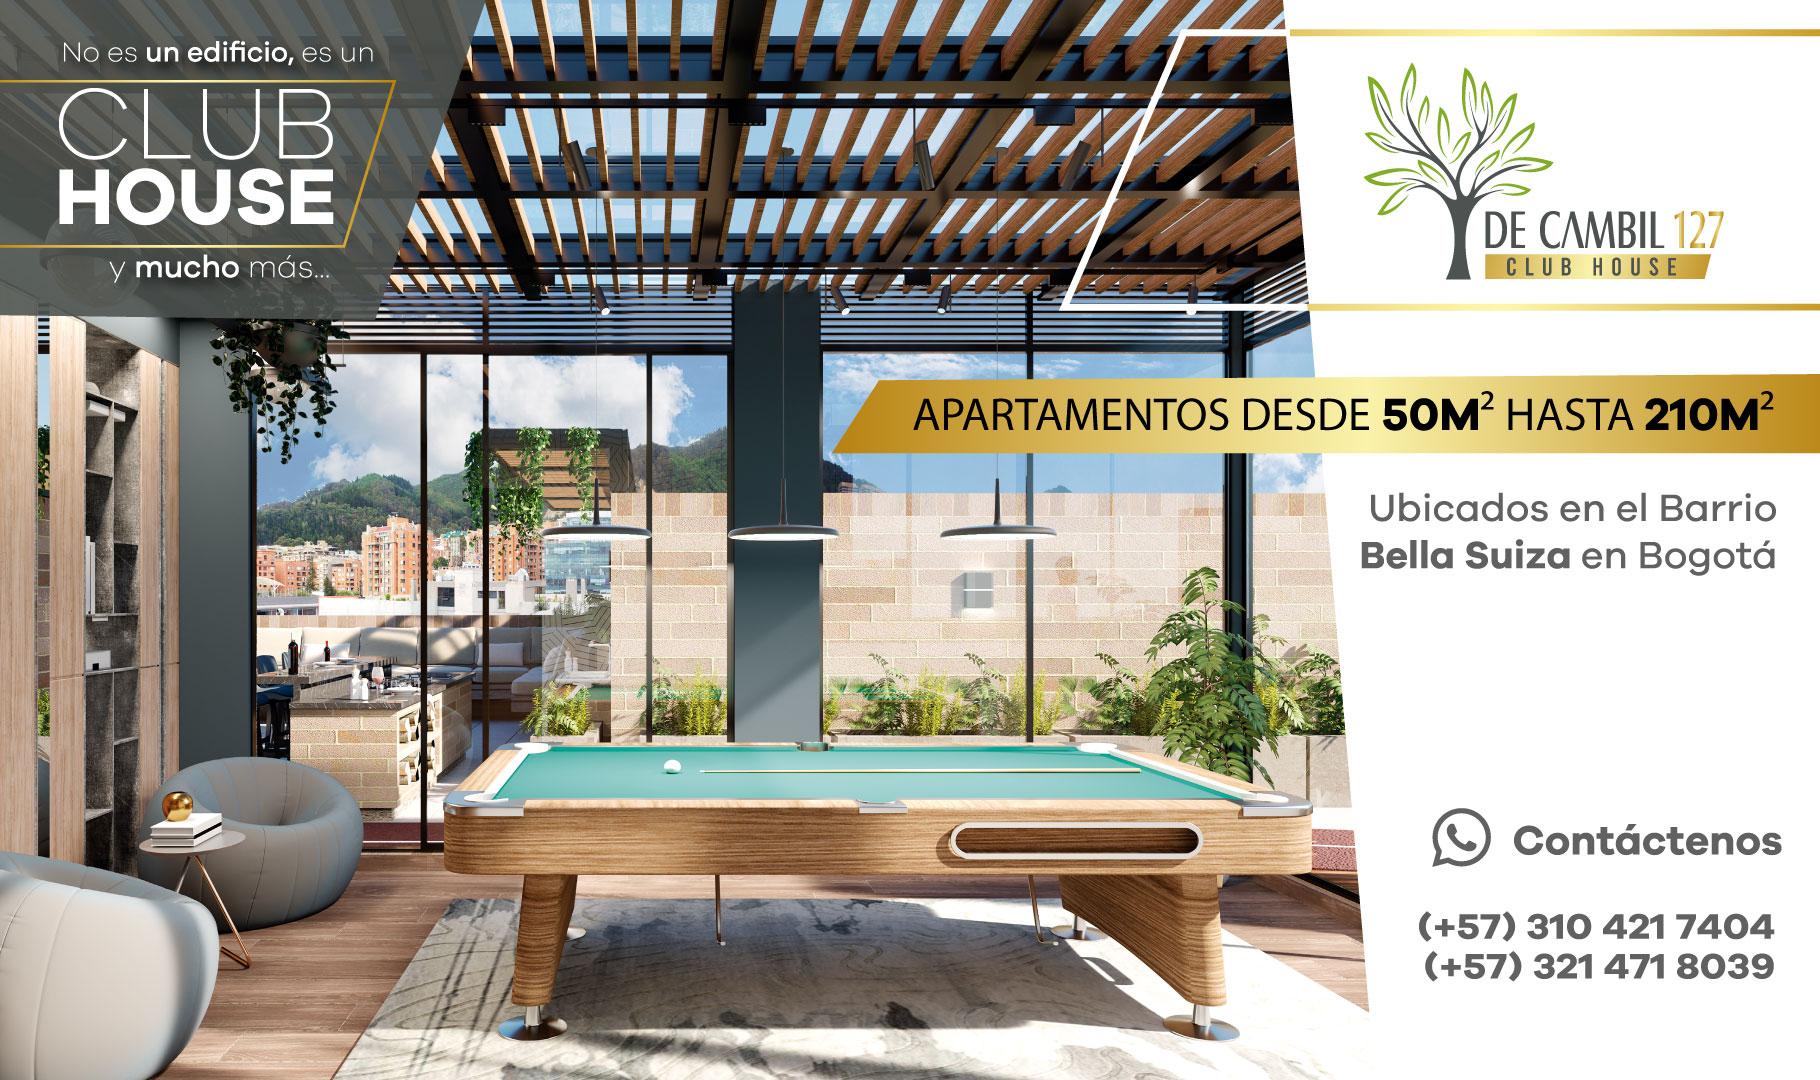 127 club house Bella Suiza Bogotá